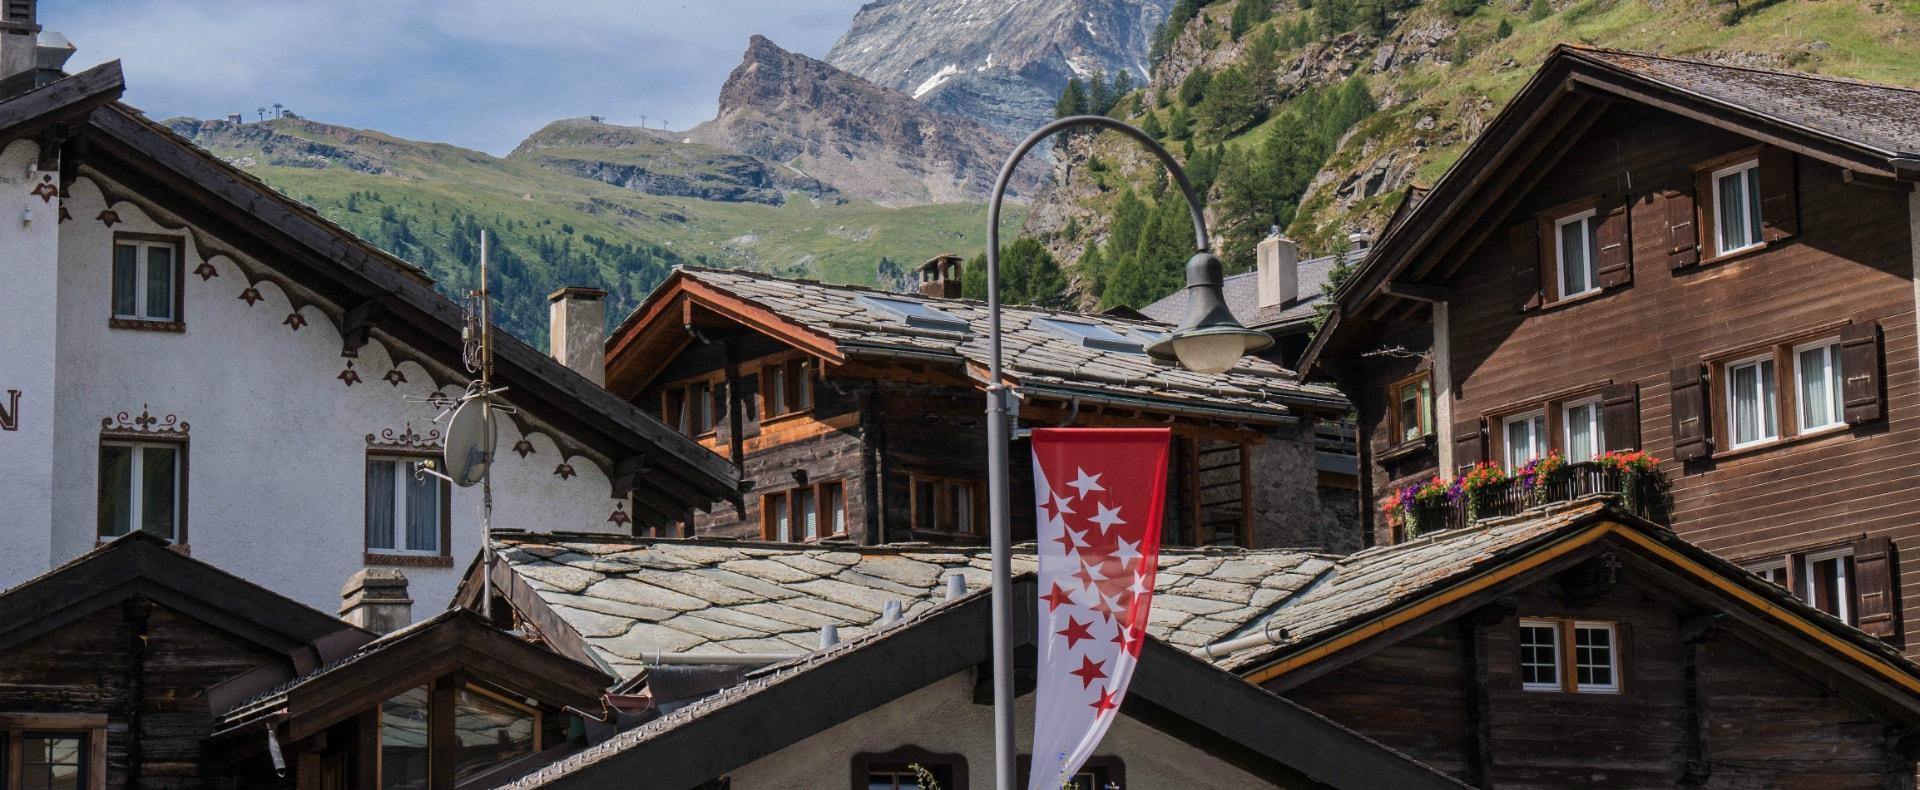 Zermatt, Switzerland gallery